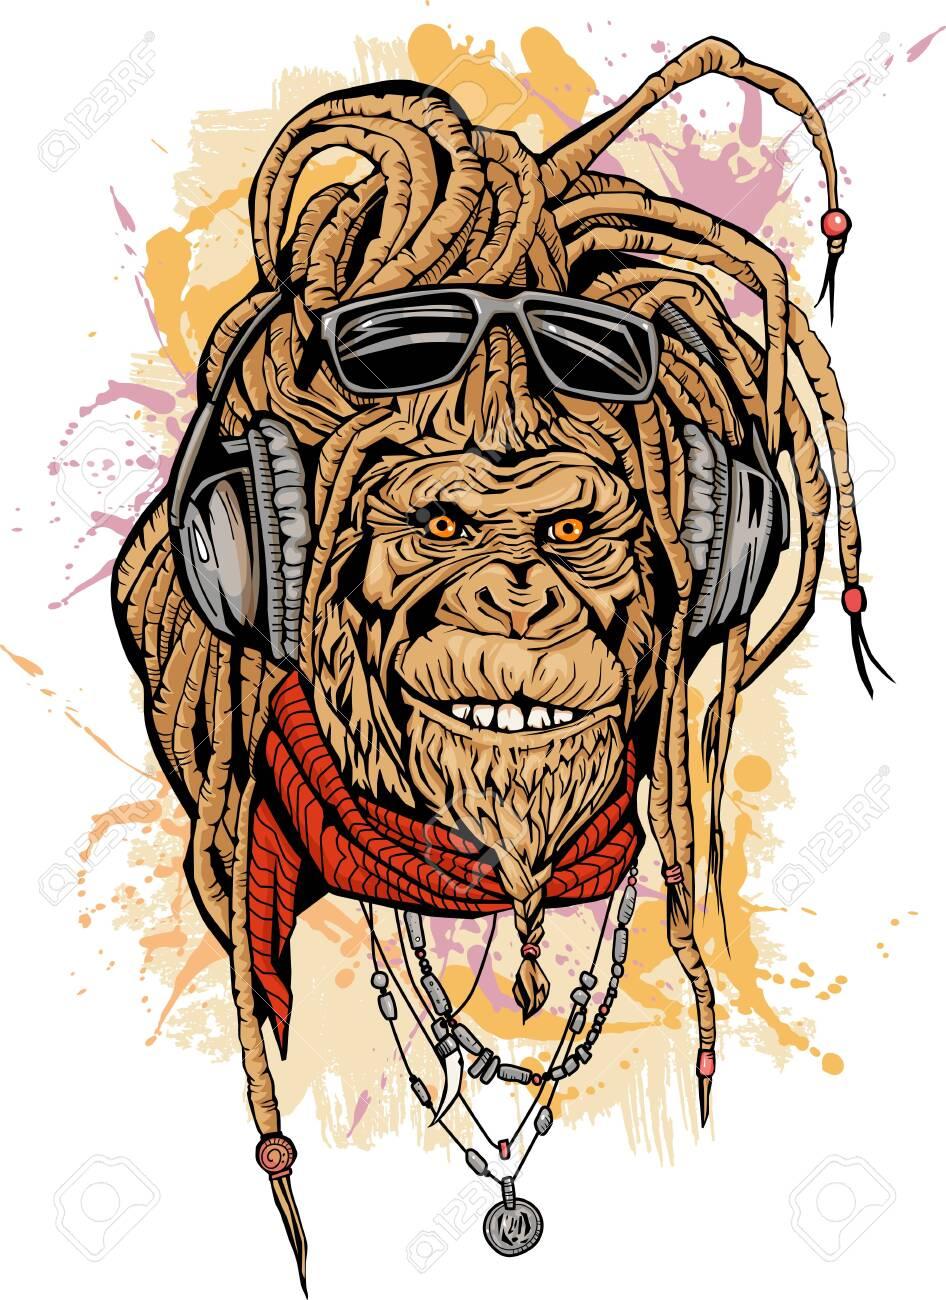 Portarit of club DJ rasta mokey with color - 134470561